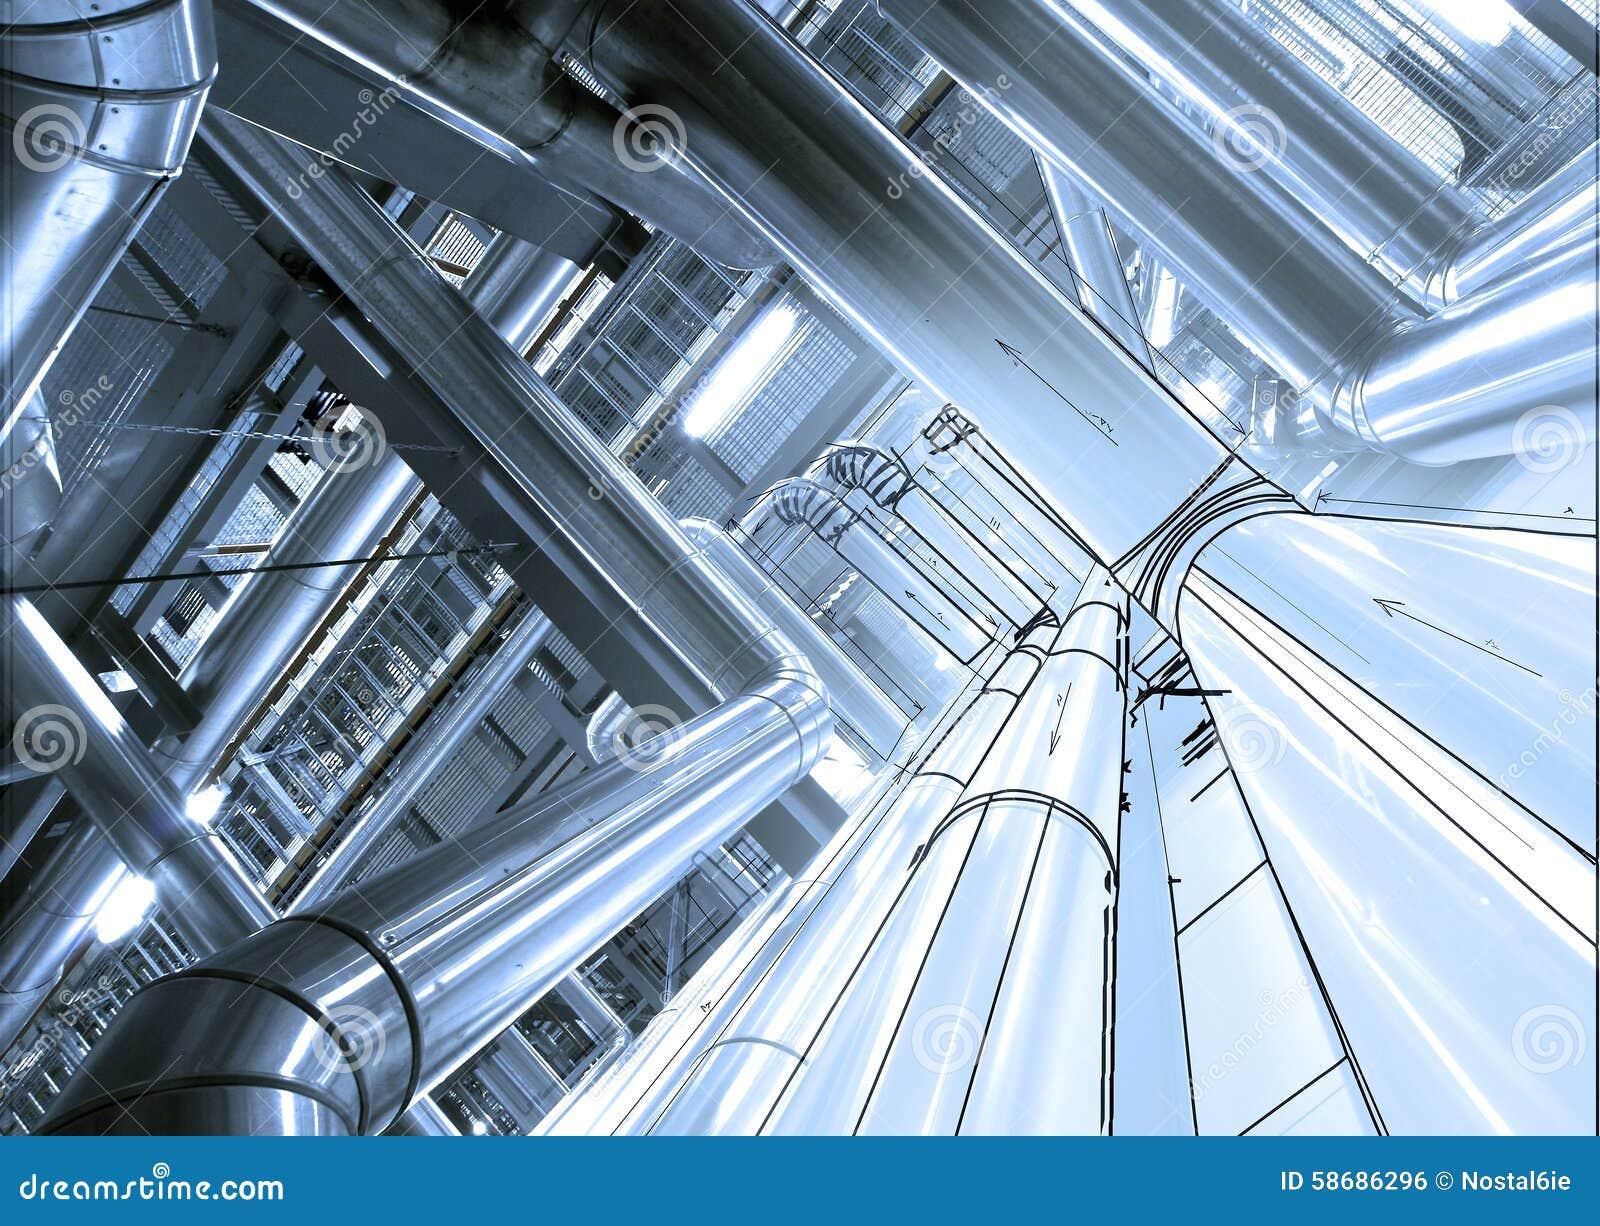 Pipeline Design Conception Stock Photo Image Of Equipment